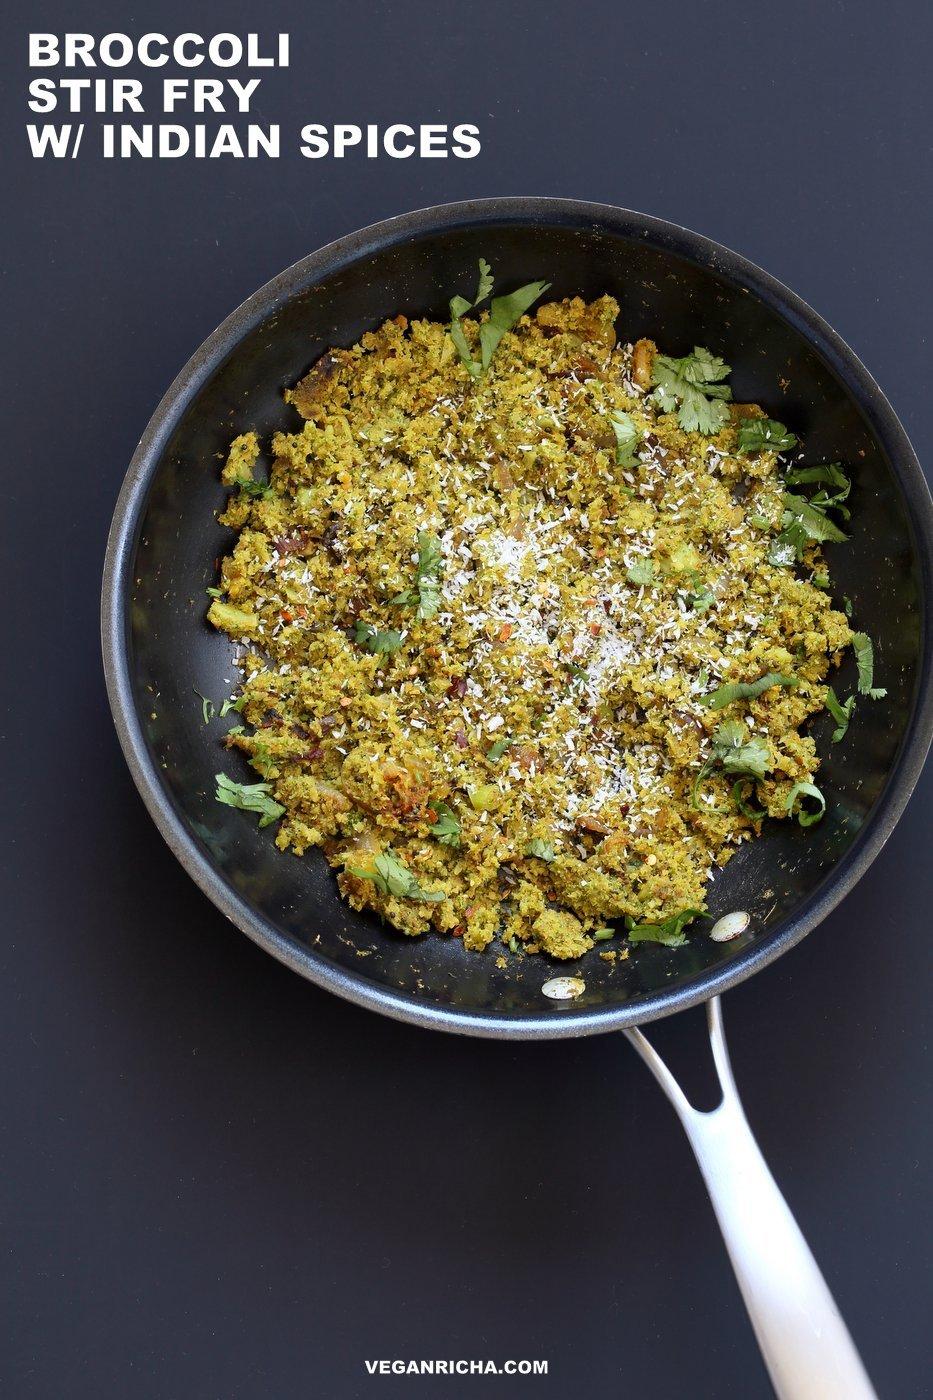 Broccoli Stir Fry With Indian Spices Broccoli Sabji Vegan Richa